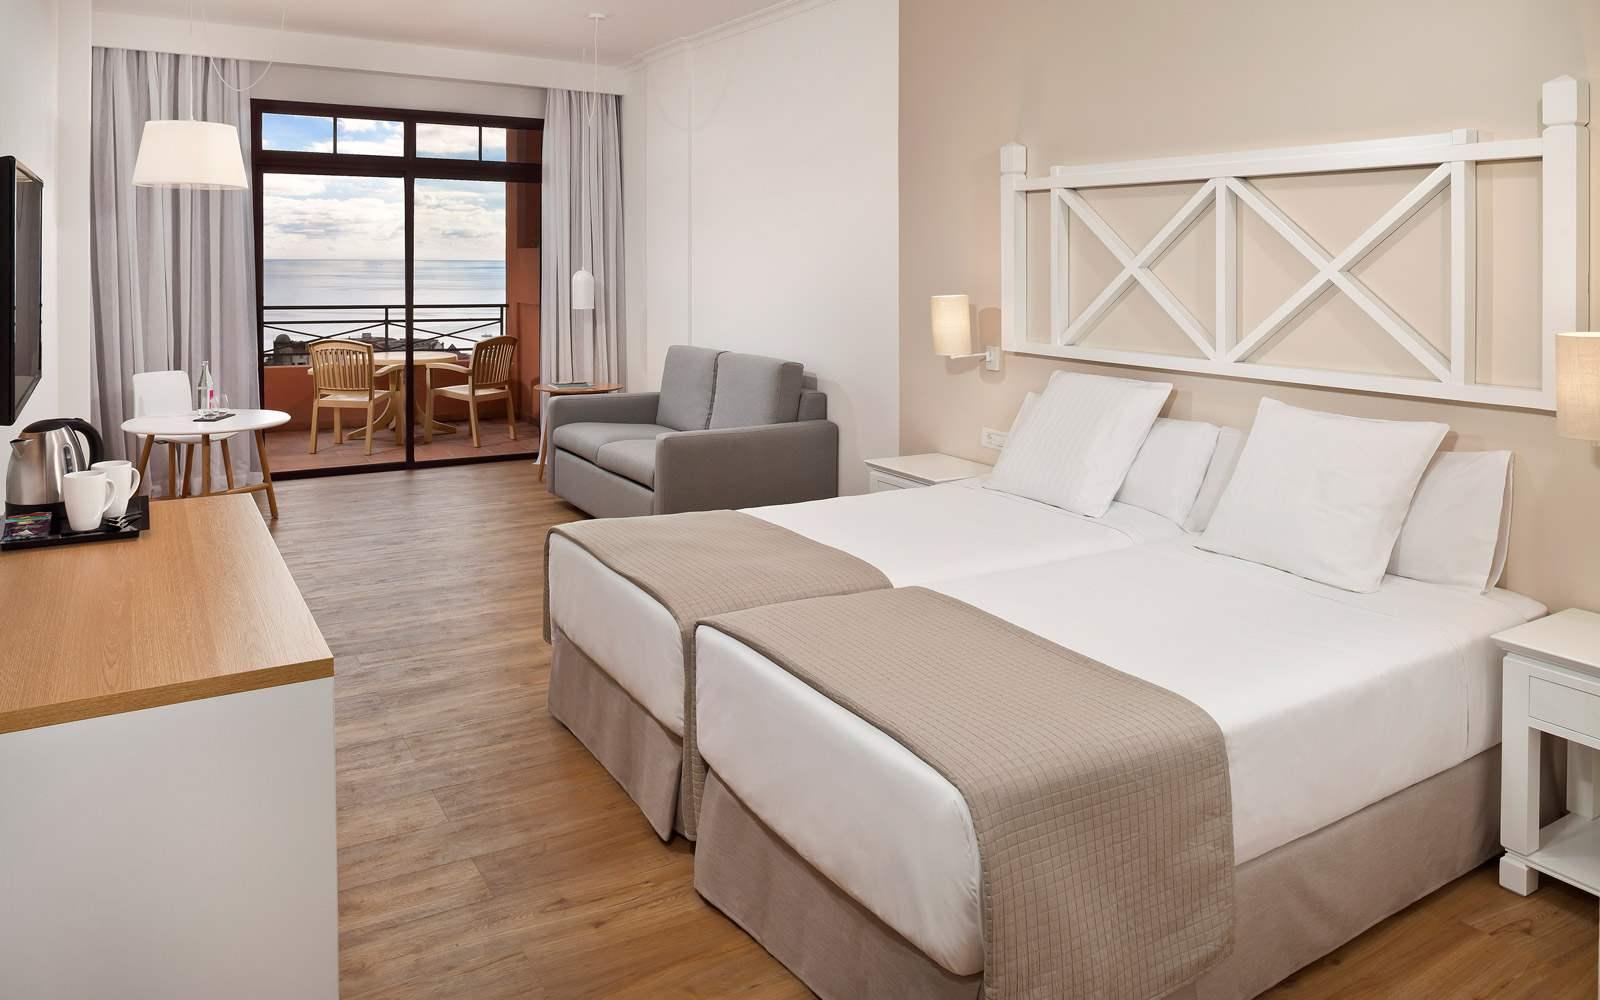 Melia Jardines del Teide - Deluxe room seaview